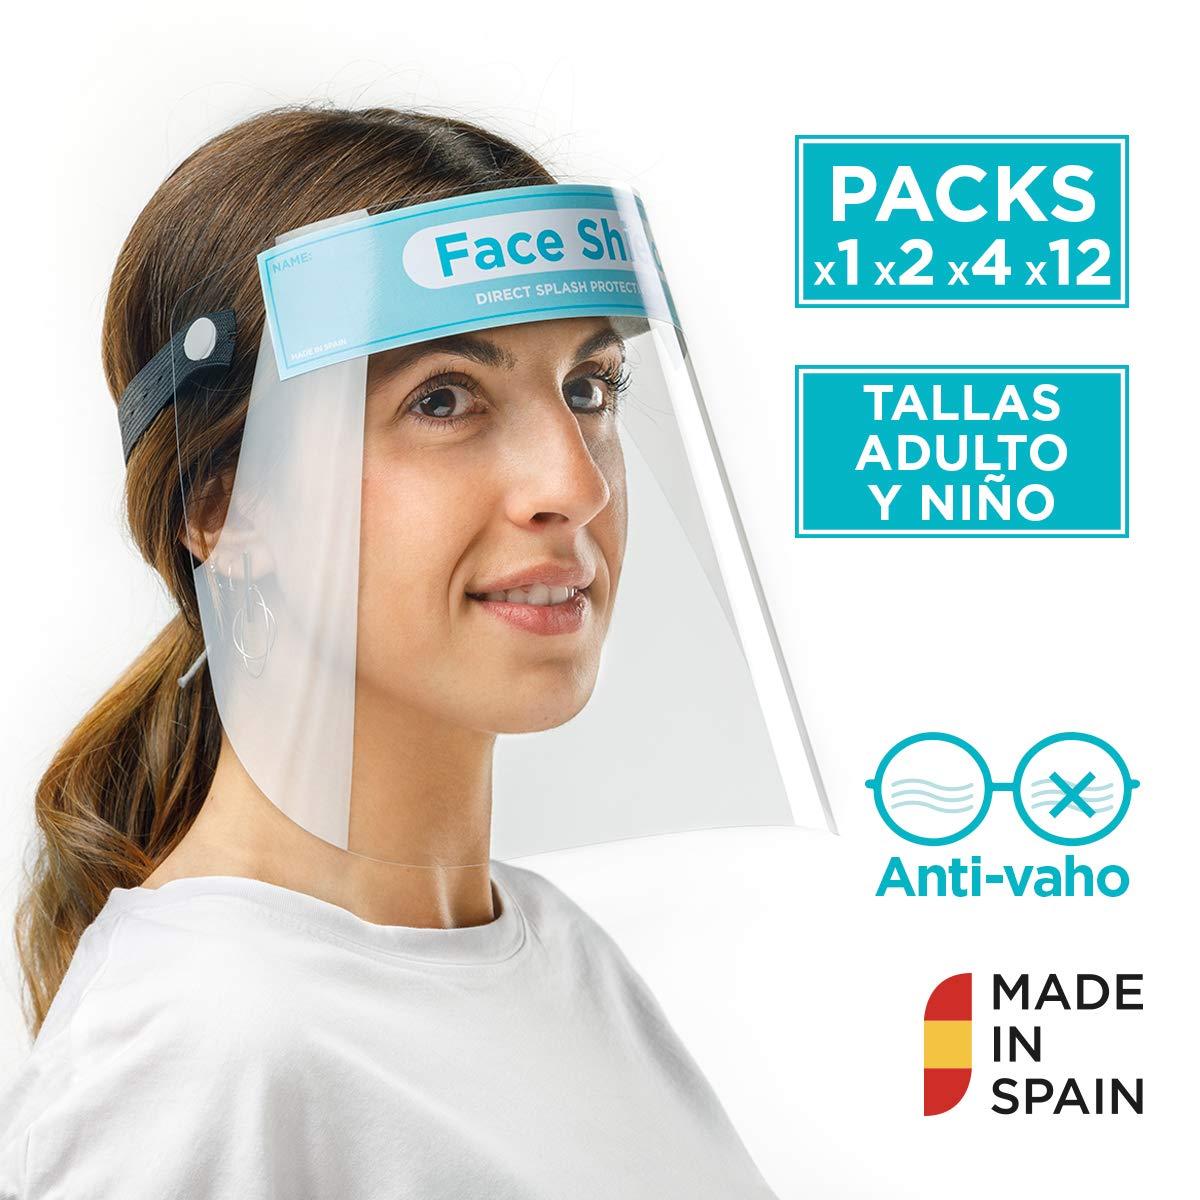 Pantalla Protección Facial Sonaprotec - Protector Facial Antivaho. Talla Niños y Adultos. Visera Protectora para la Cara Face Shield Fabricadas en España - Talla Pequeña - Pack 1